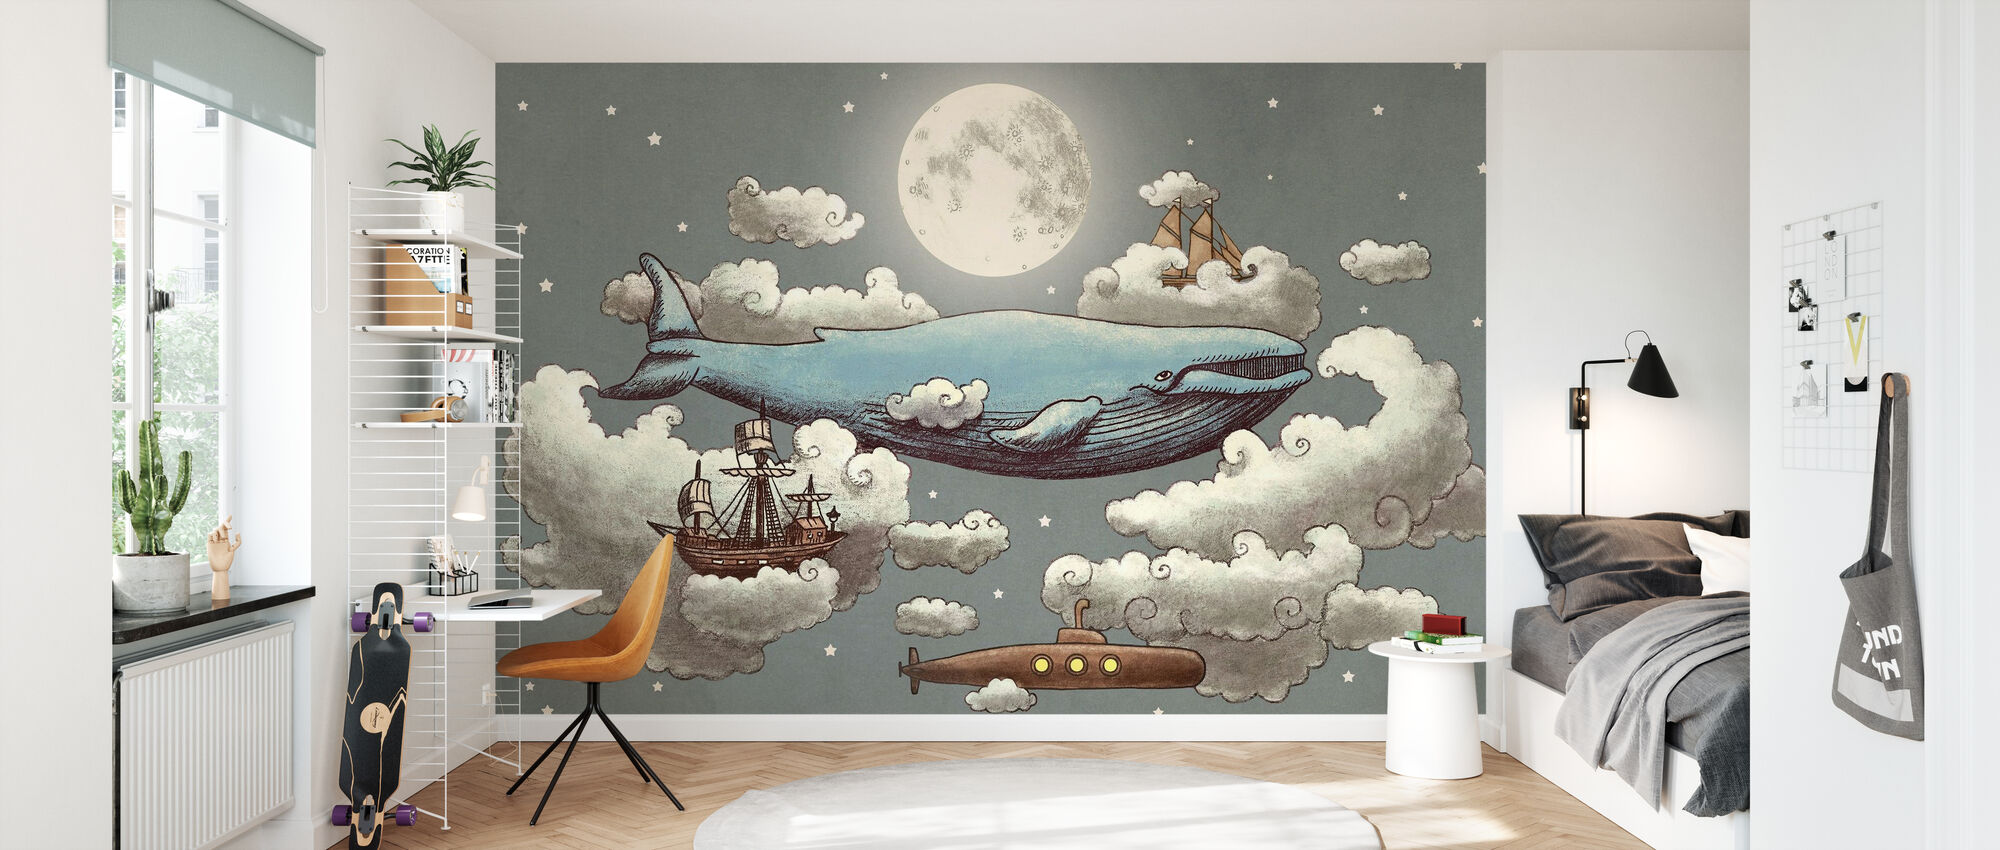 Ocean Meets Sky Original - Tapete - Kinderzimmer